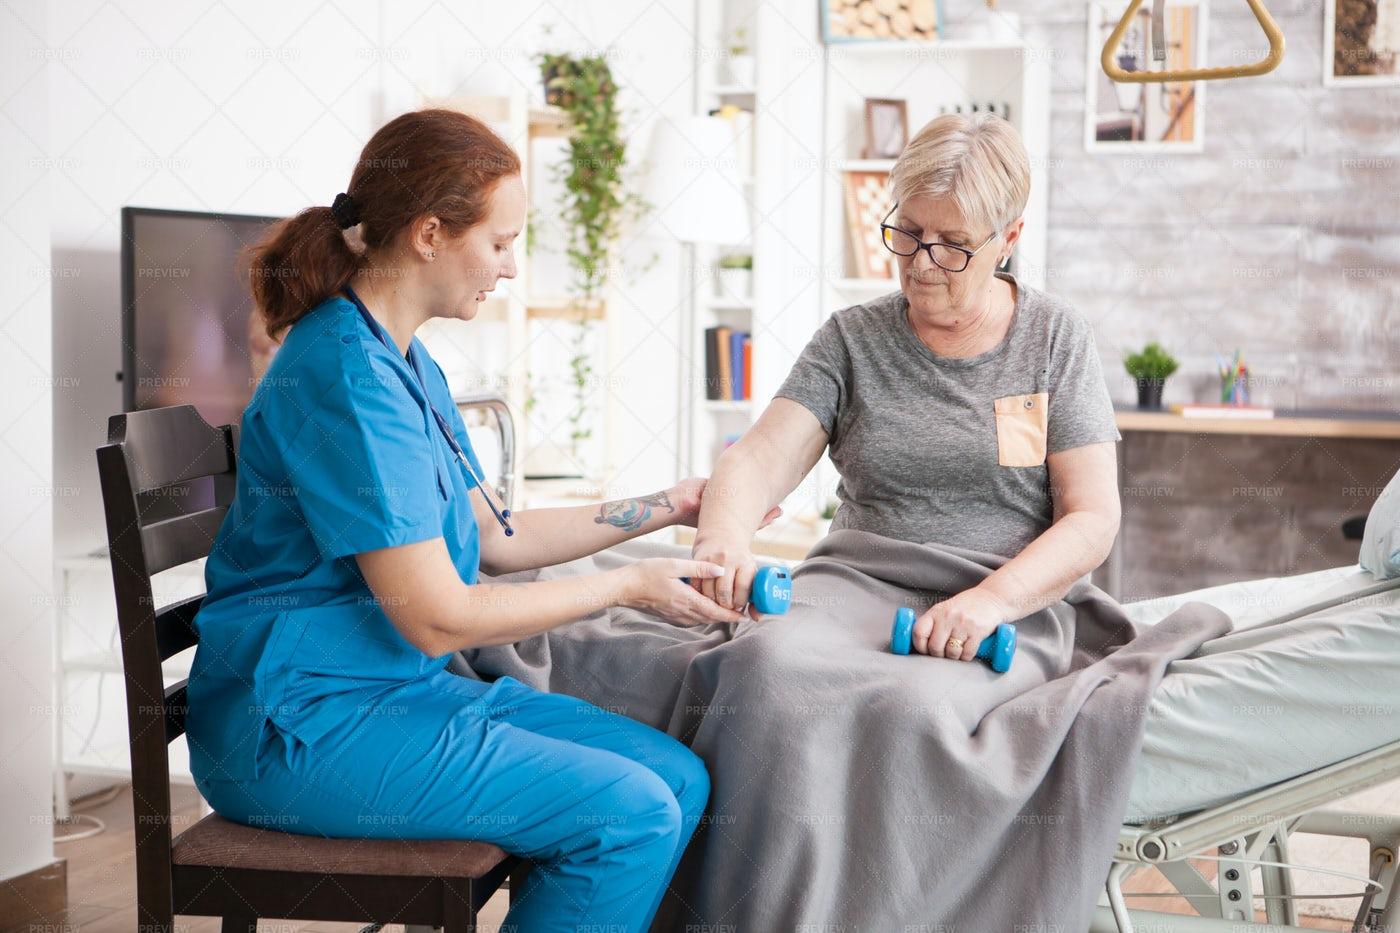 Exercise In The Nursing Home: Stock Photos